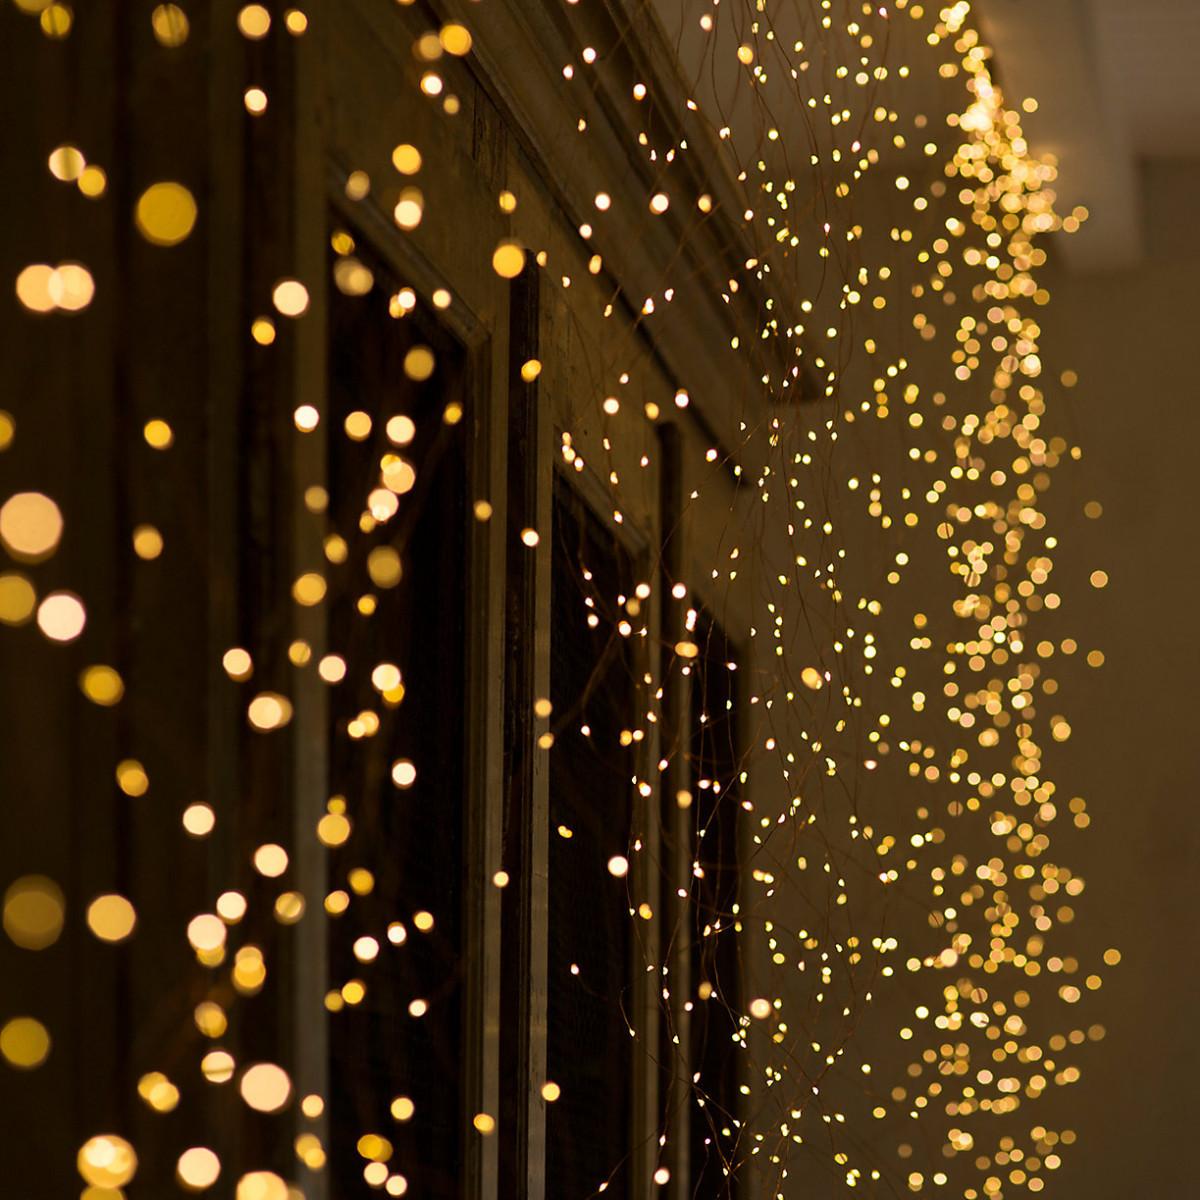 "Гирлянда уличная ""Конский хвост"" 200 LED: 10 линий по 2 м, 20 диодов цвет - тёпло-белый, динамический режим,"